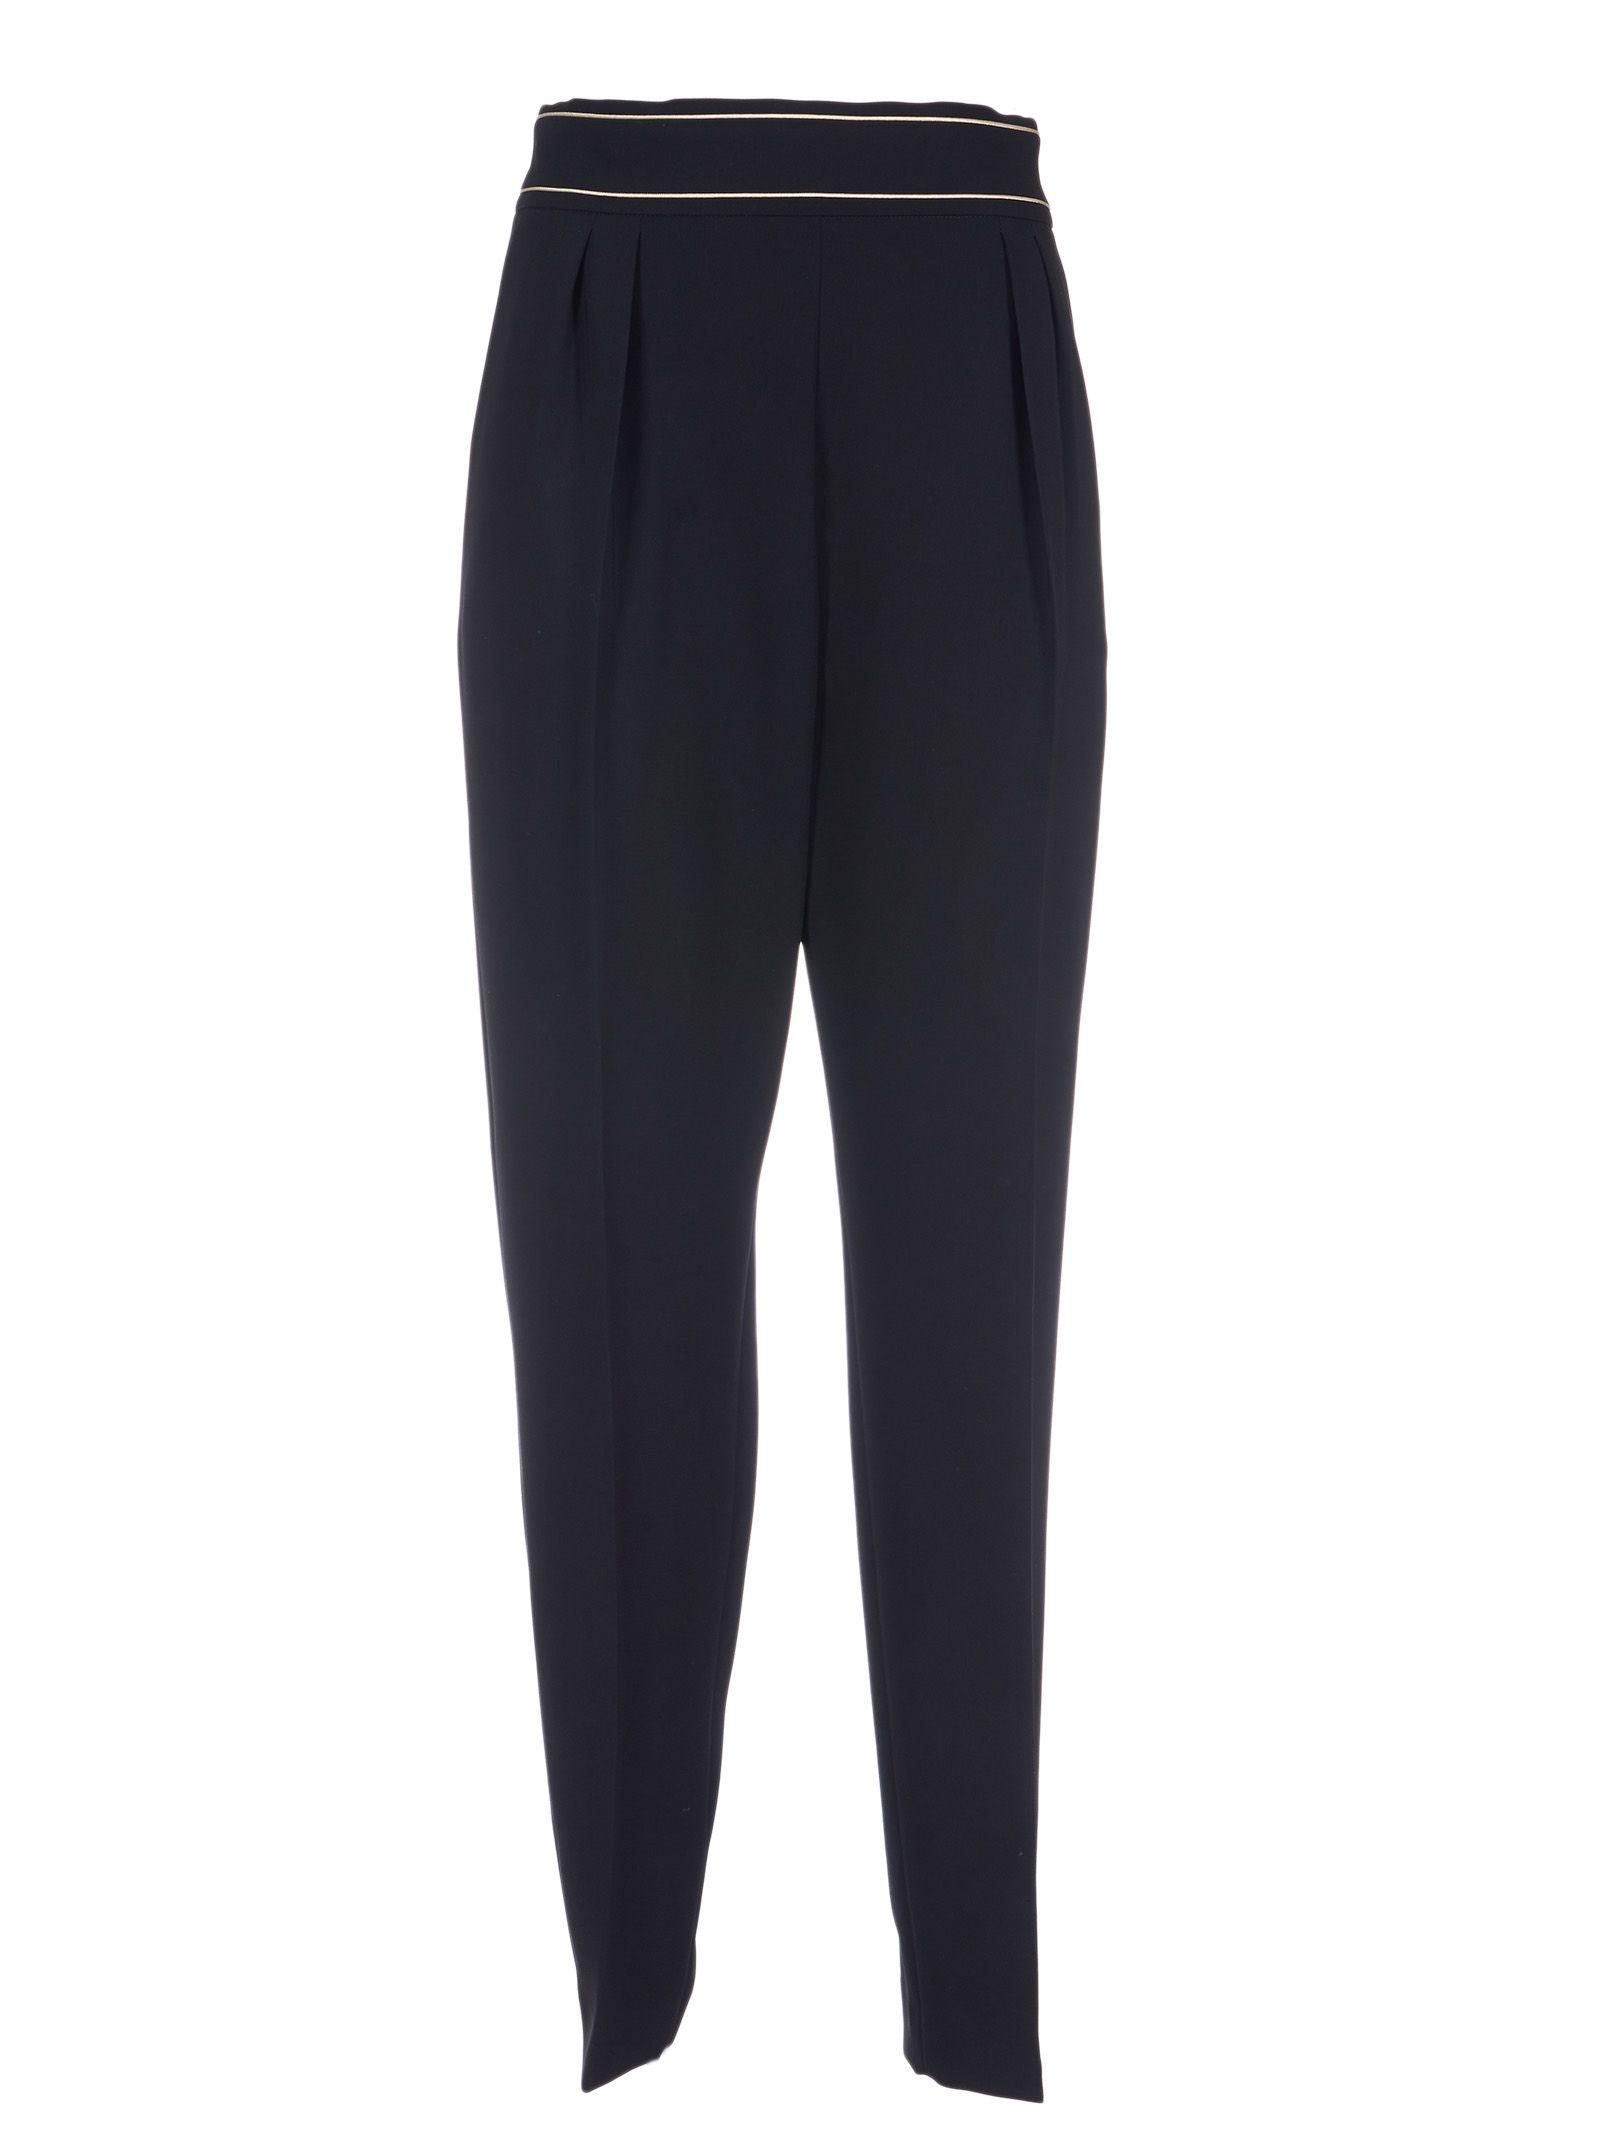 Max Mara Tapered Trousers